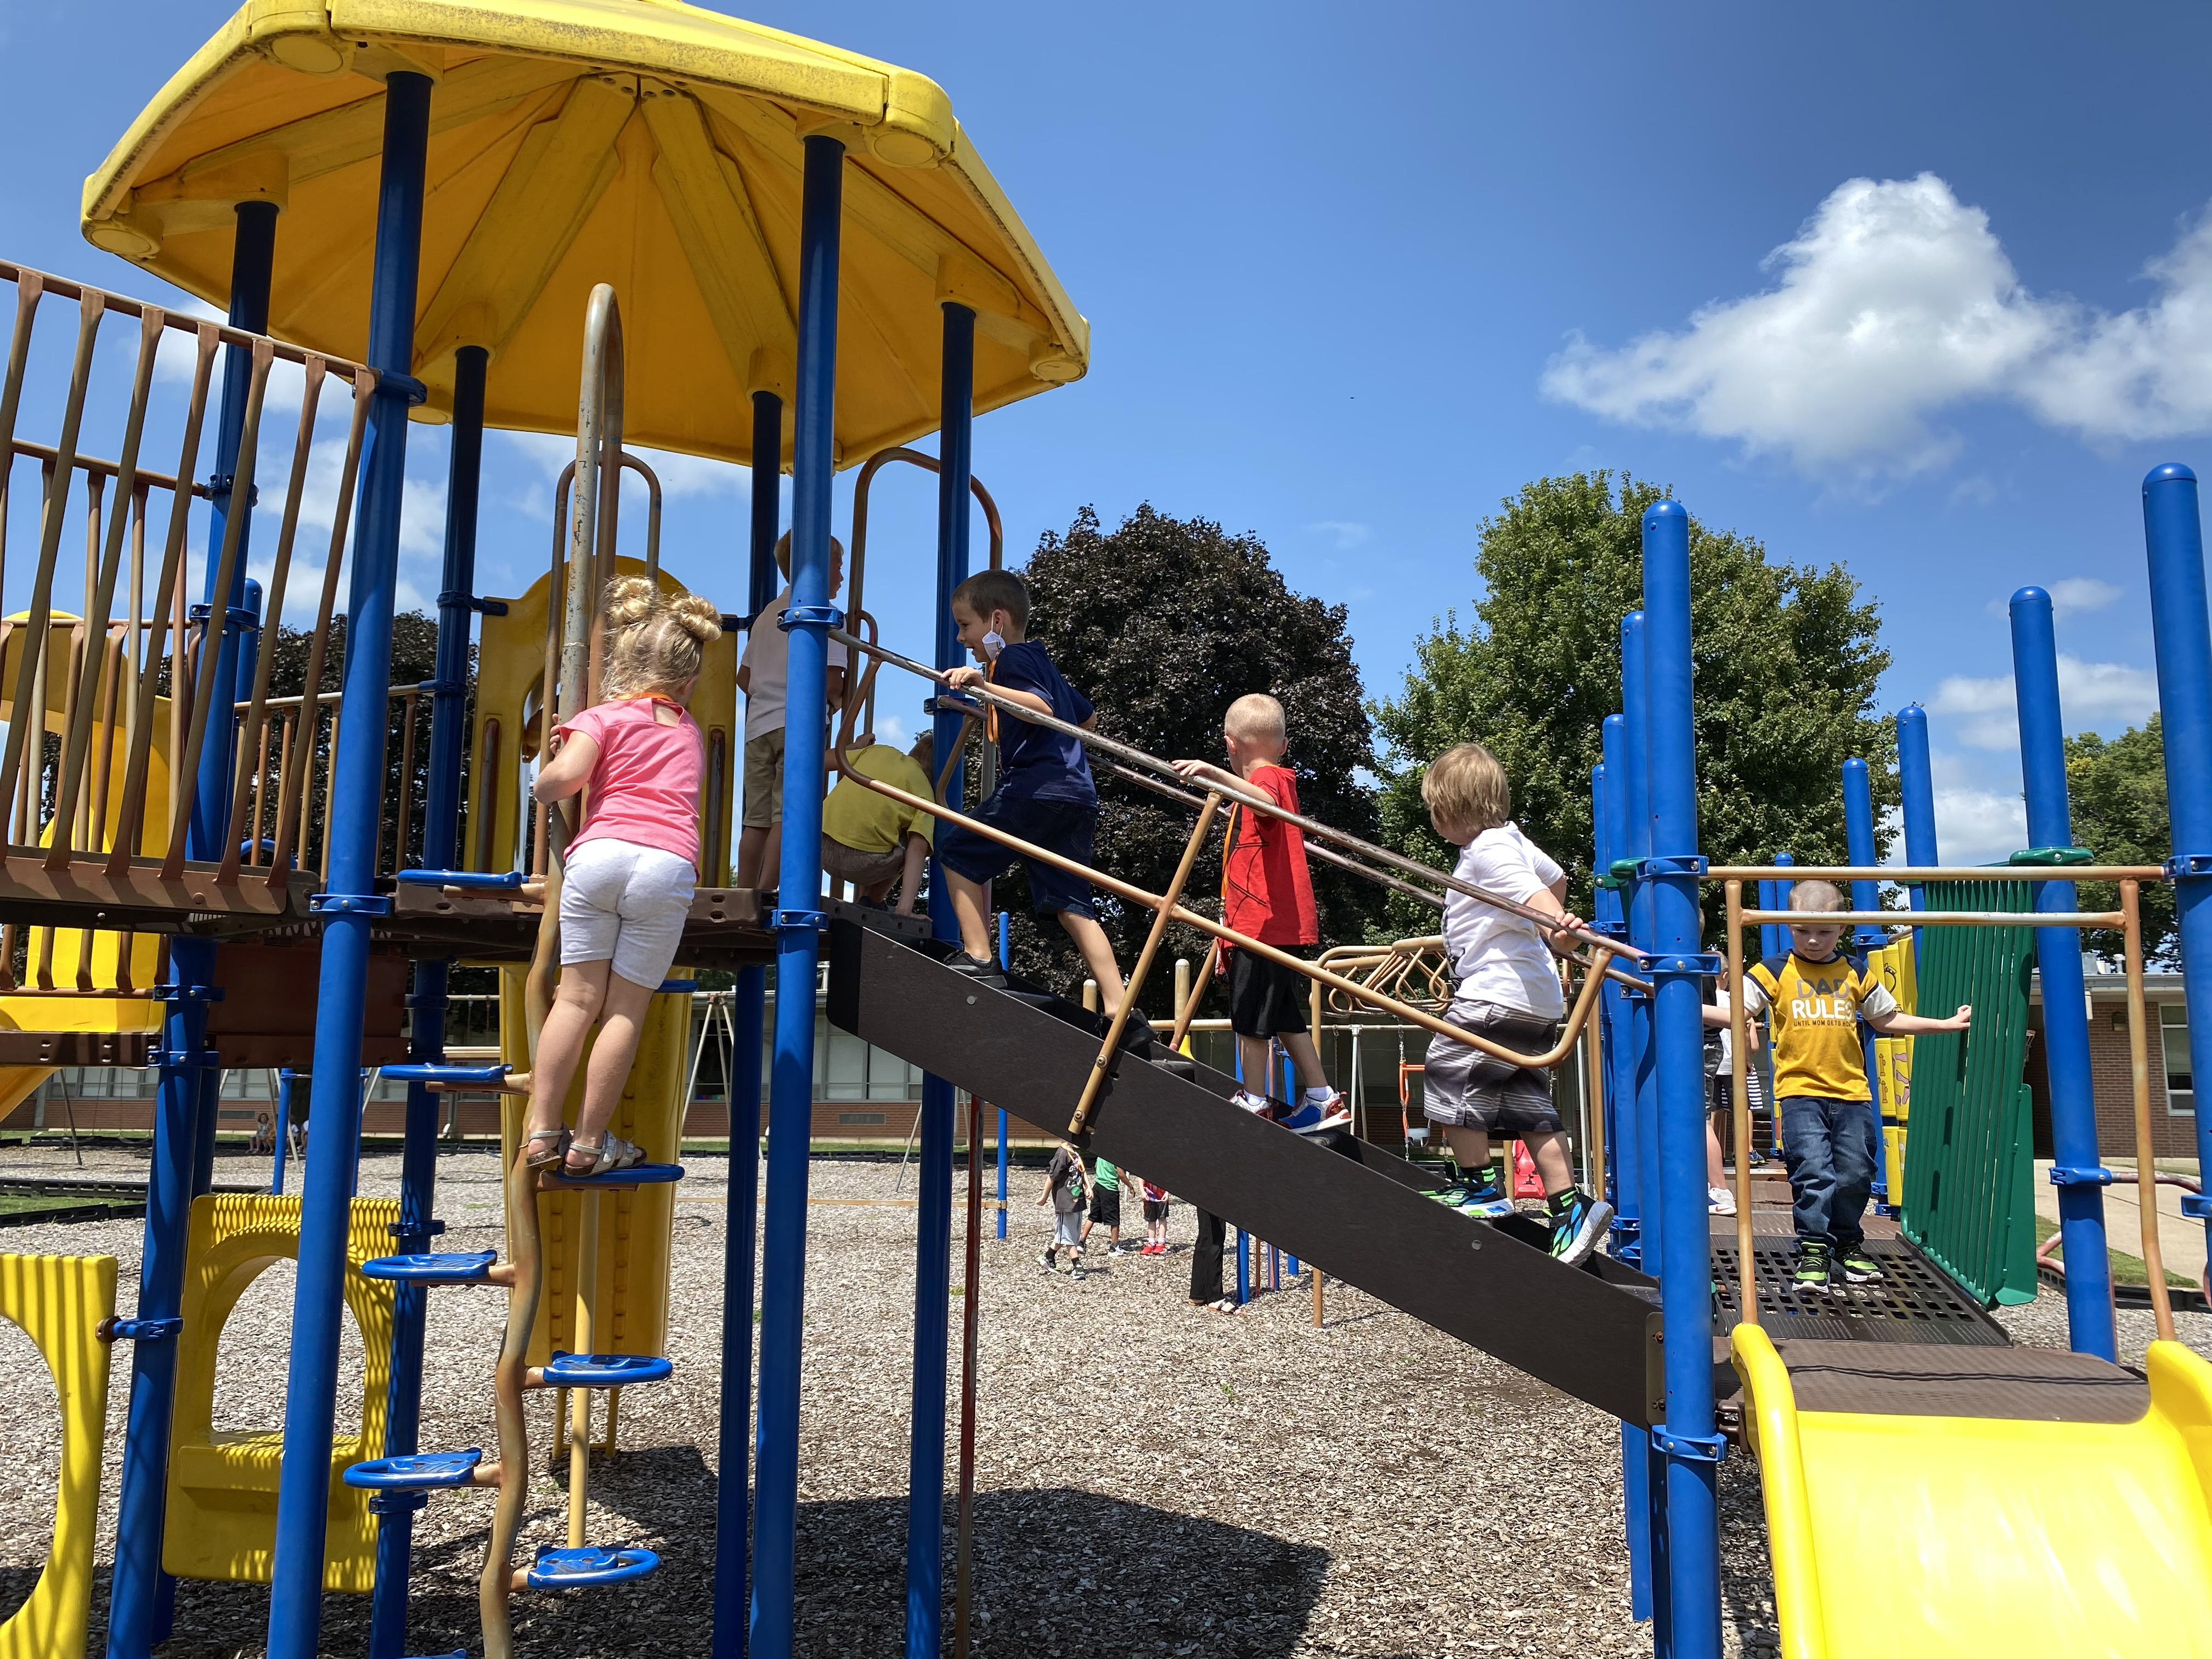 Outdoor recess play